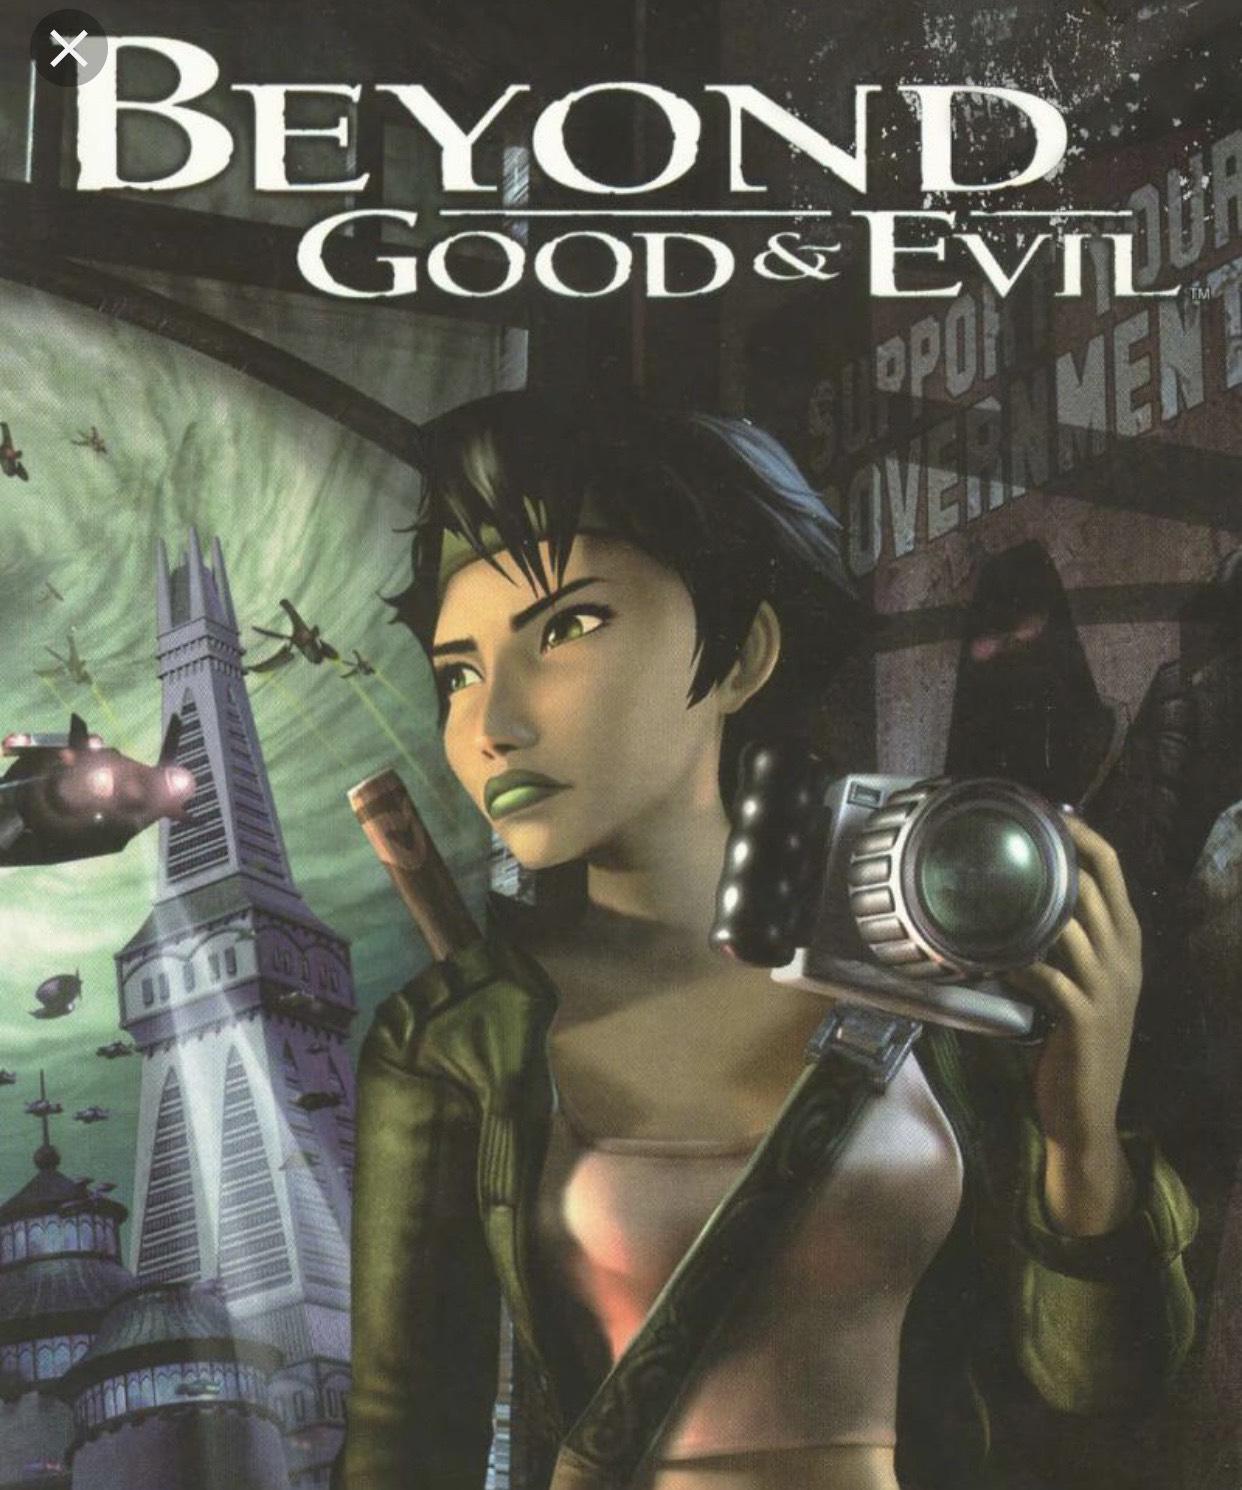 Beyond Good & Evil HD (Xbox 360/Xbox one) £2.22 @ Microsoft store